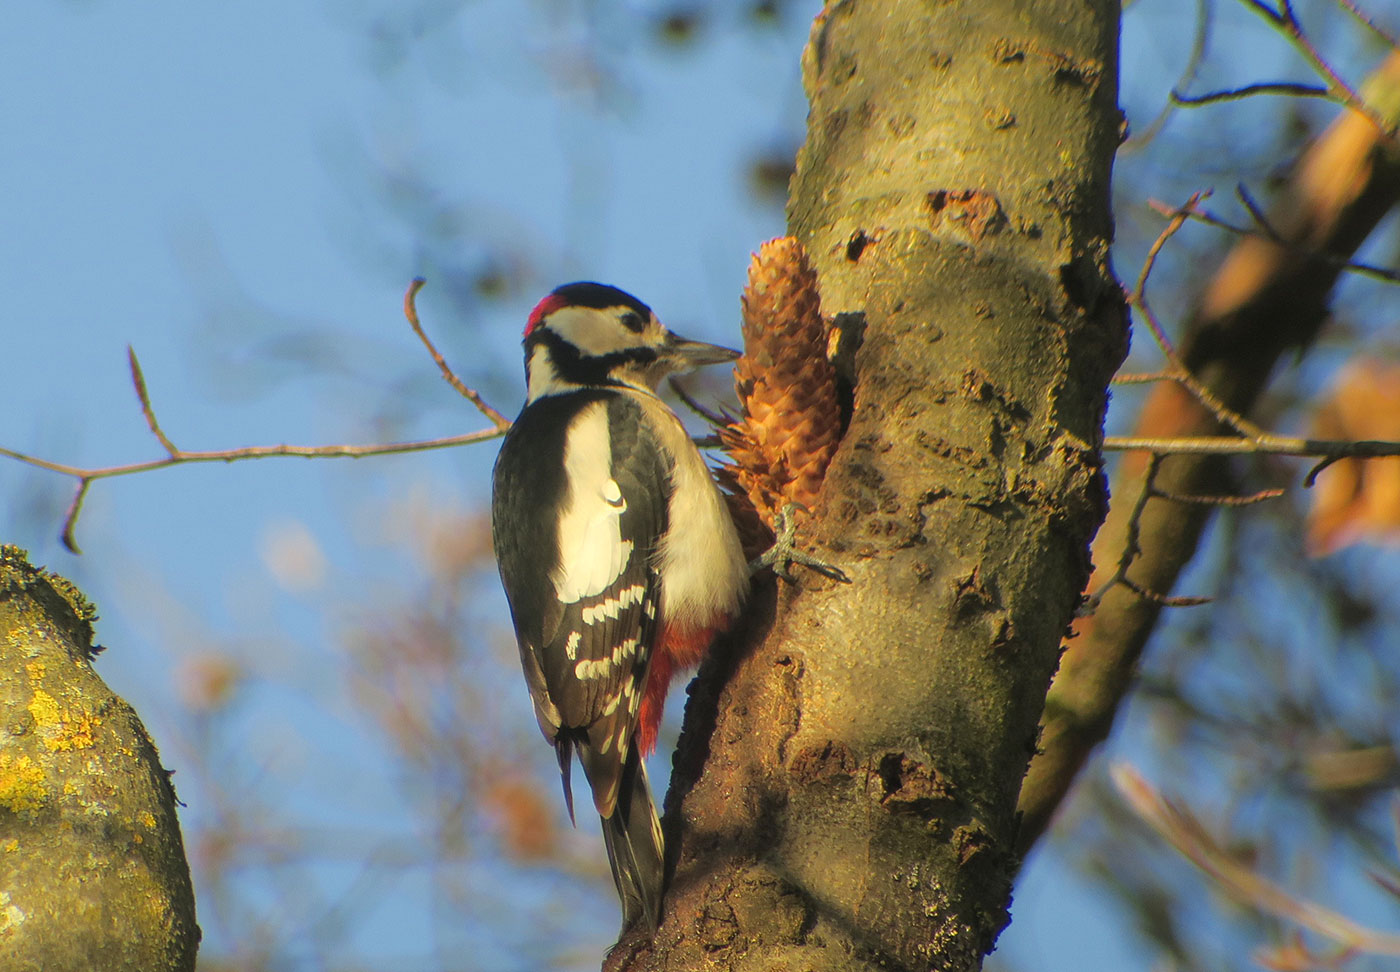 06_buntspecht_great_spotted-woodpecker_spechtschmiede_friedhof-perlacher_2018-12-26_5903